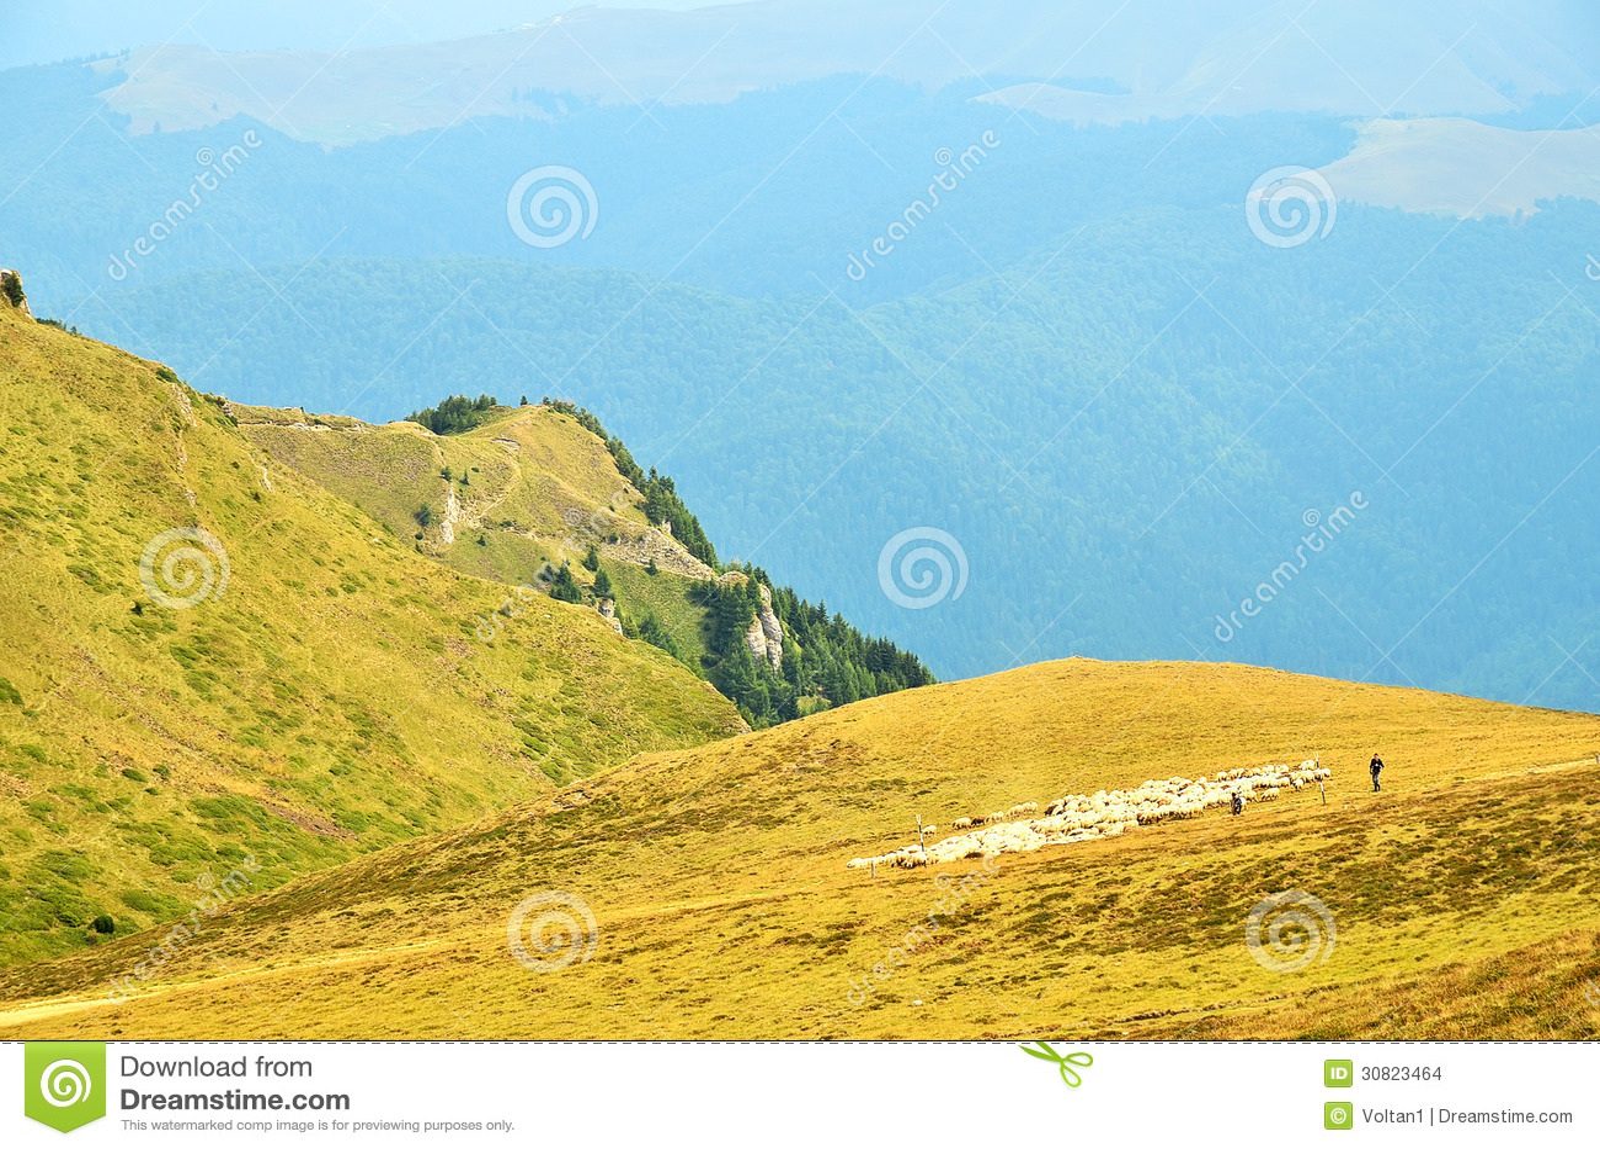 Transylvania, Romania Stock Images - Image: 30823464